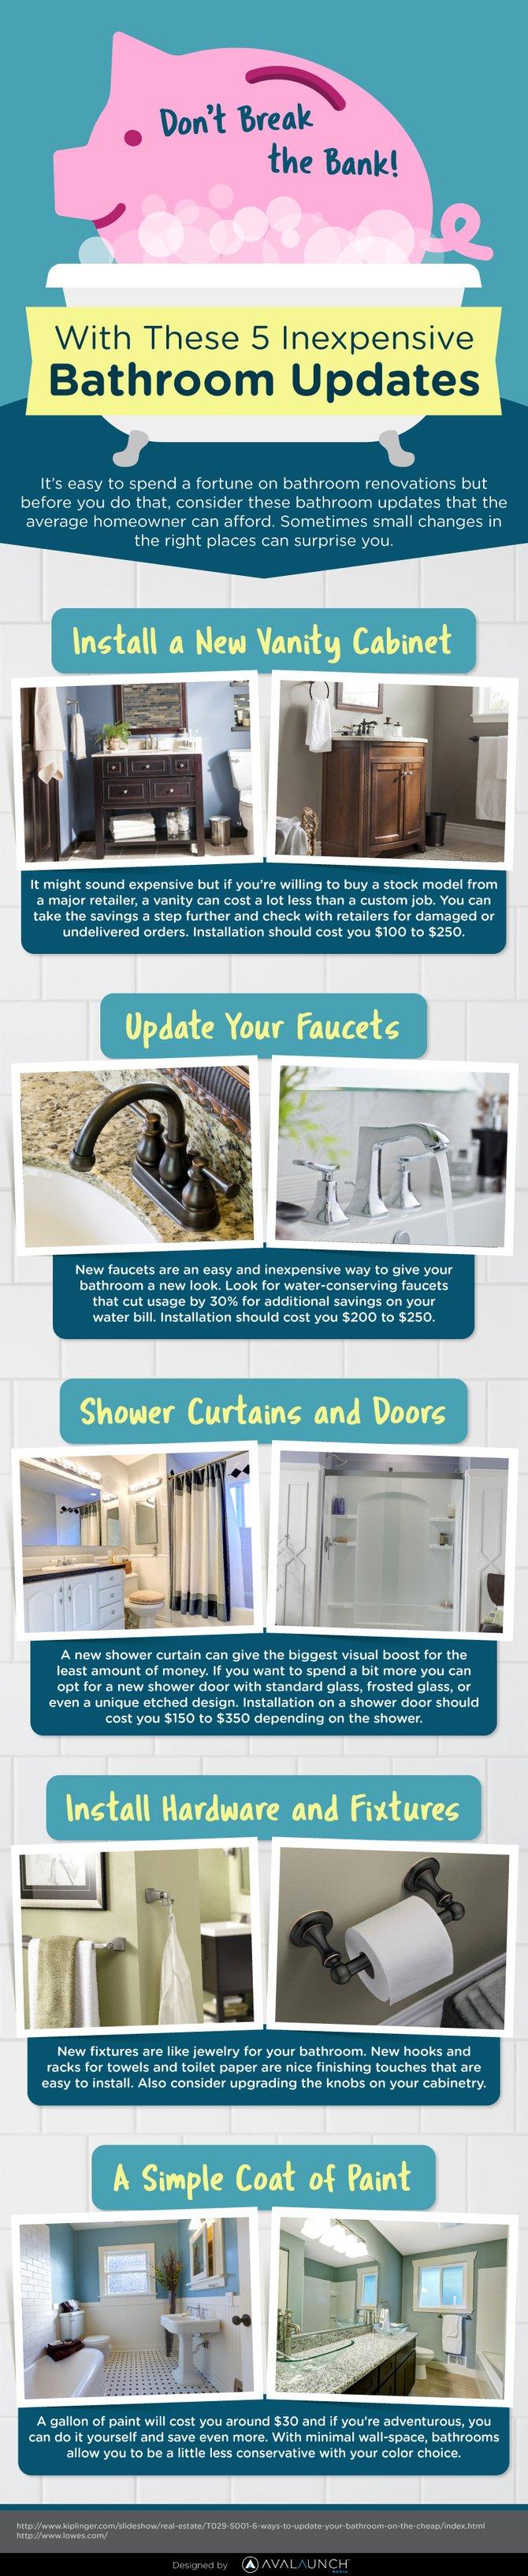 Unbranded_RE_update your bathroom-01